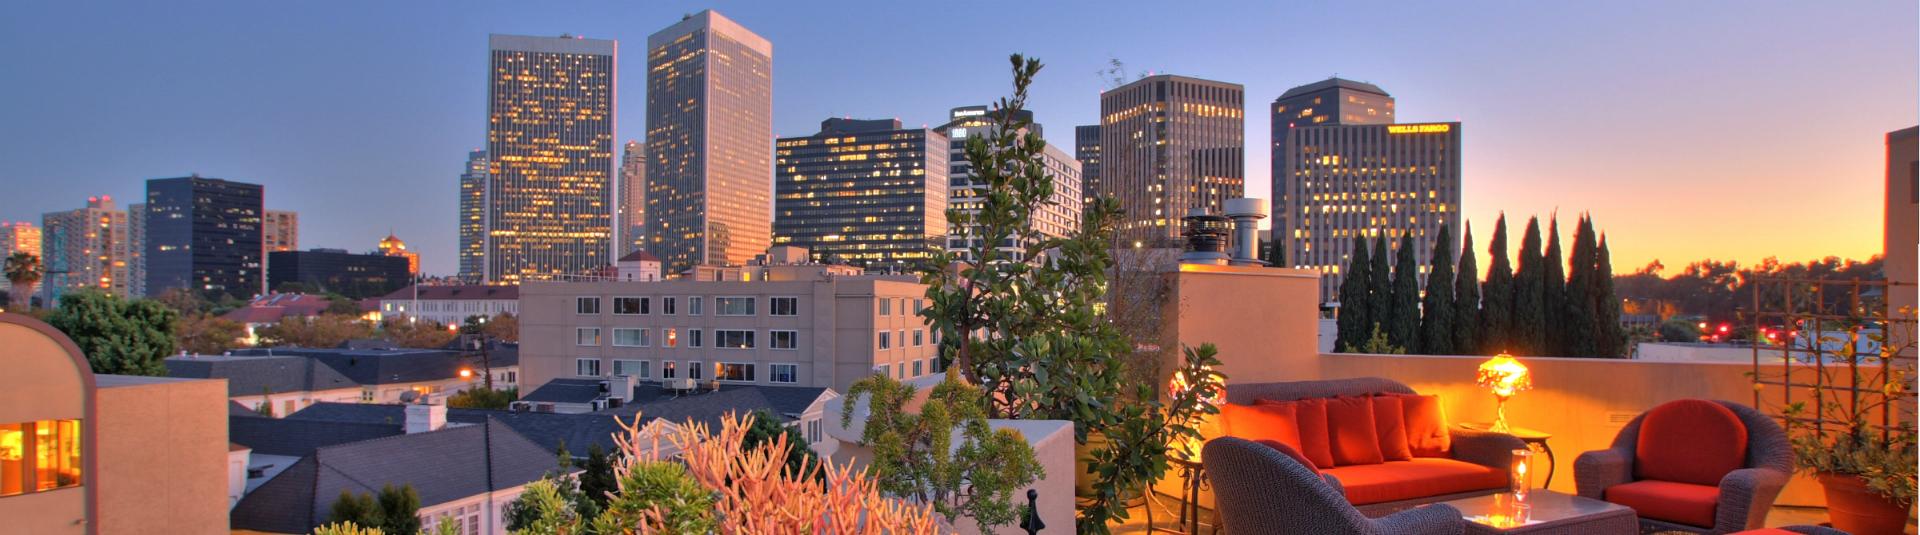 real-estate-irvine-city-horizon